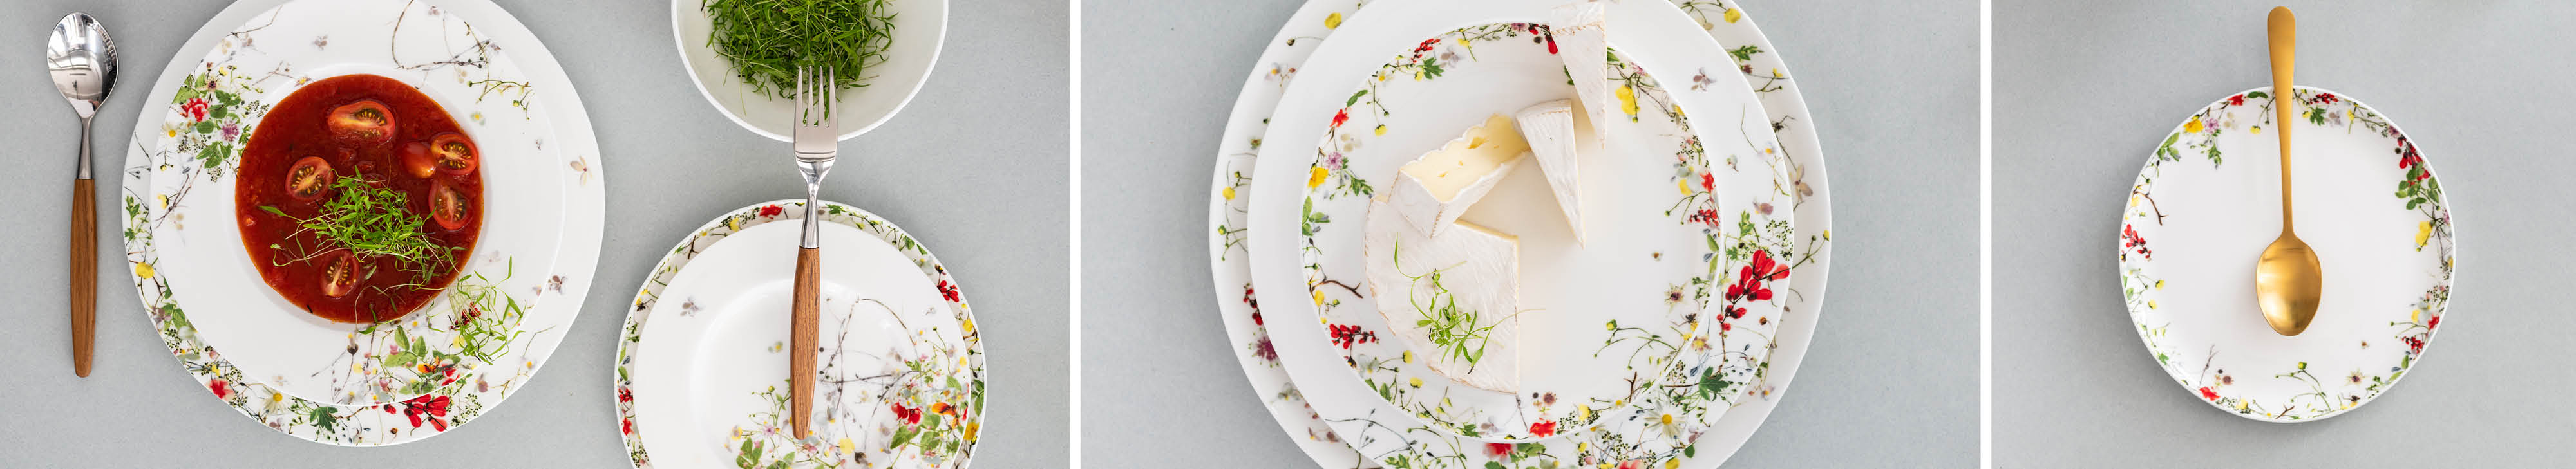 Rosenthal-Brilliance-Fleurs-Sauvages-d.jpg